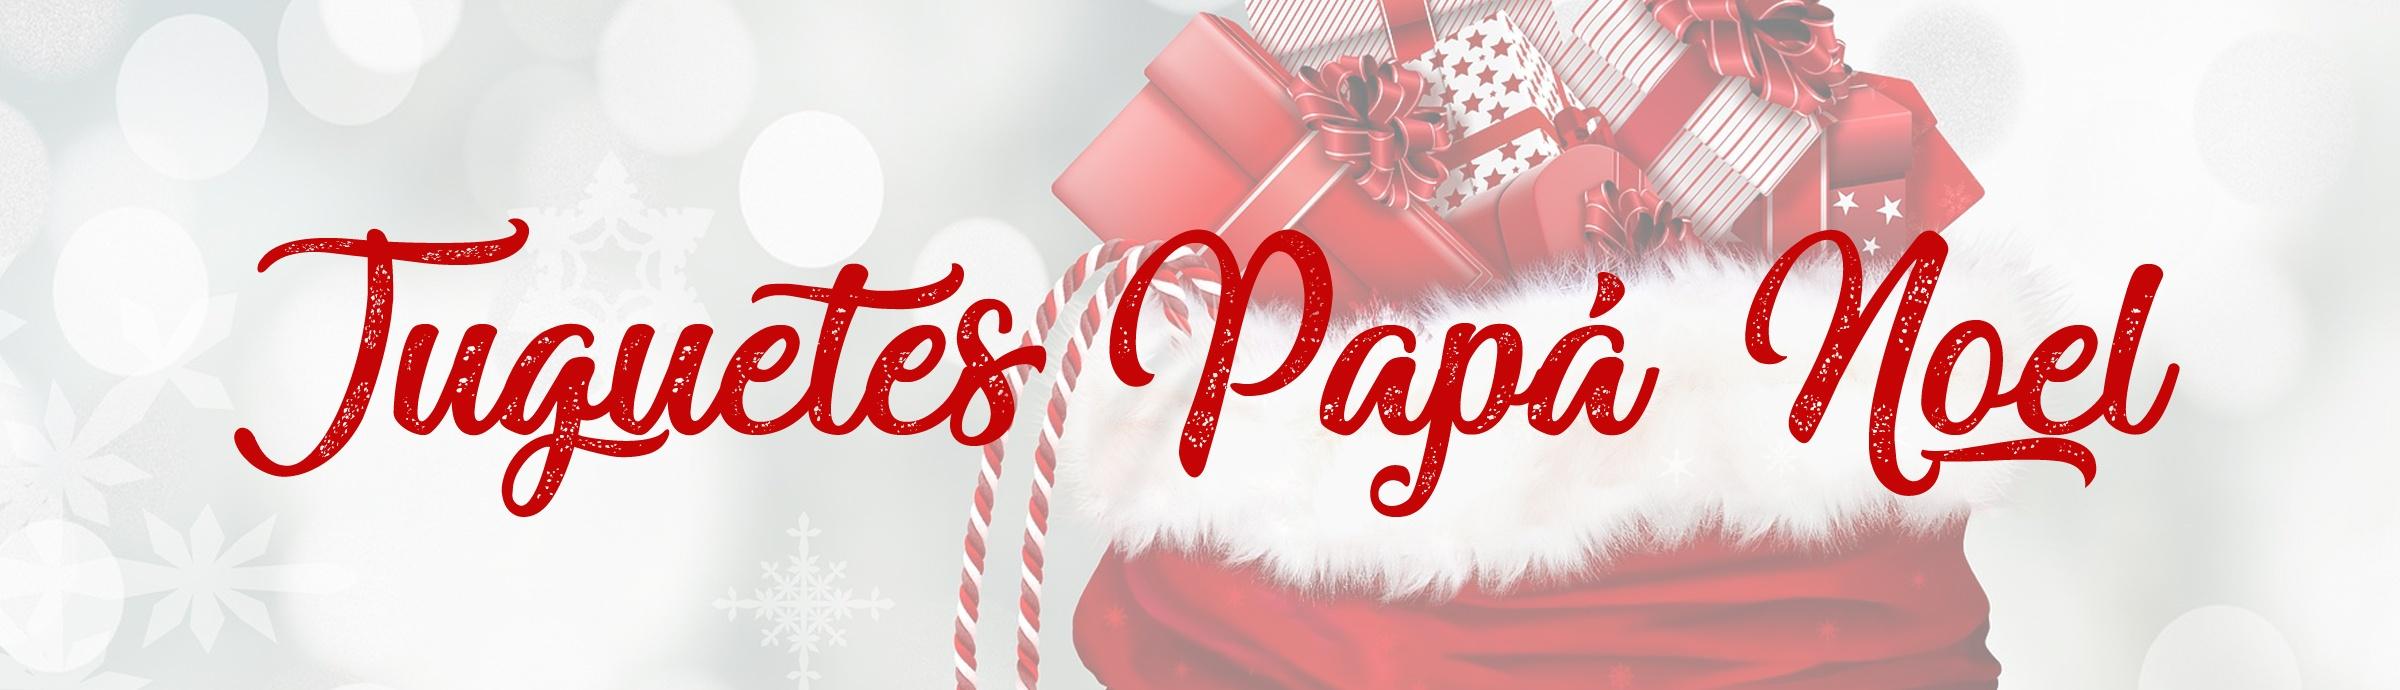 Juguetes para Papá Noel 2019